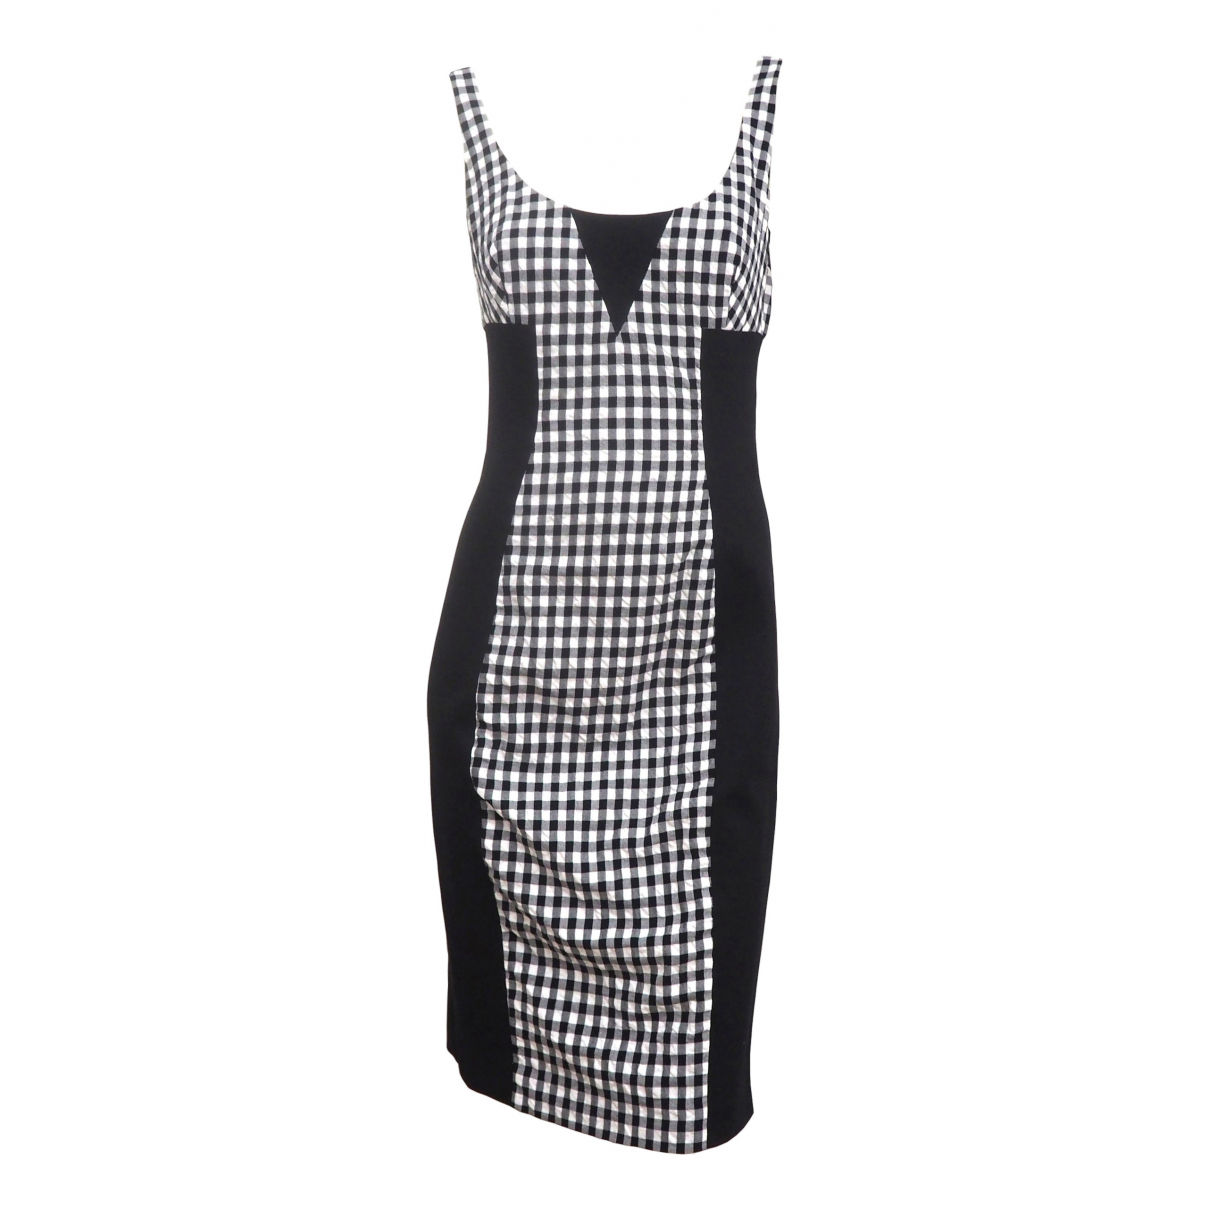 Versace \N Black Cotton dress for Women 42 IT